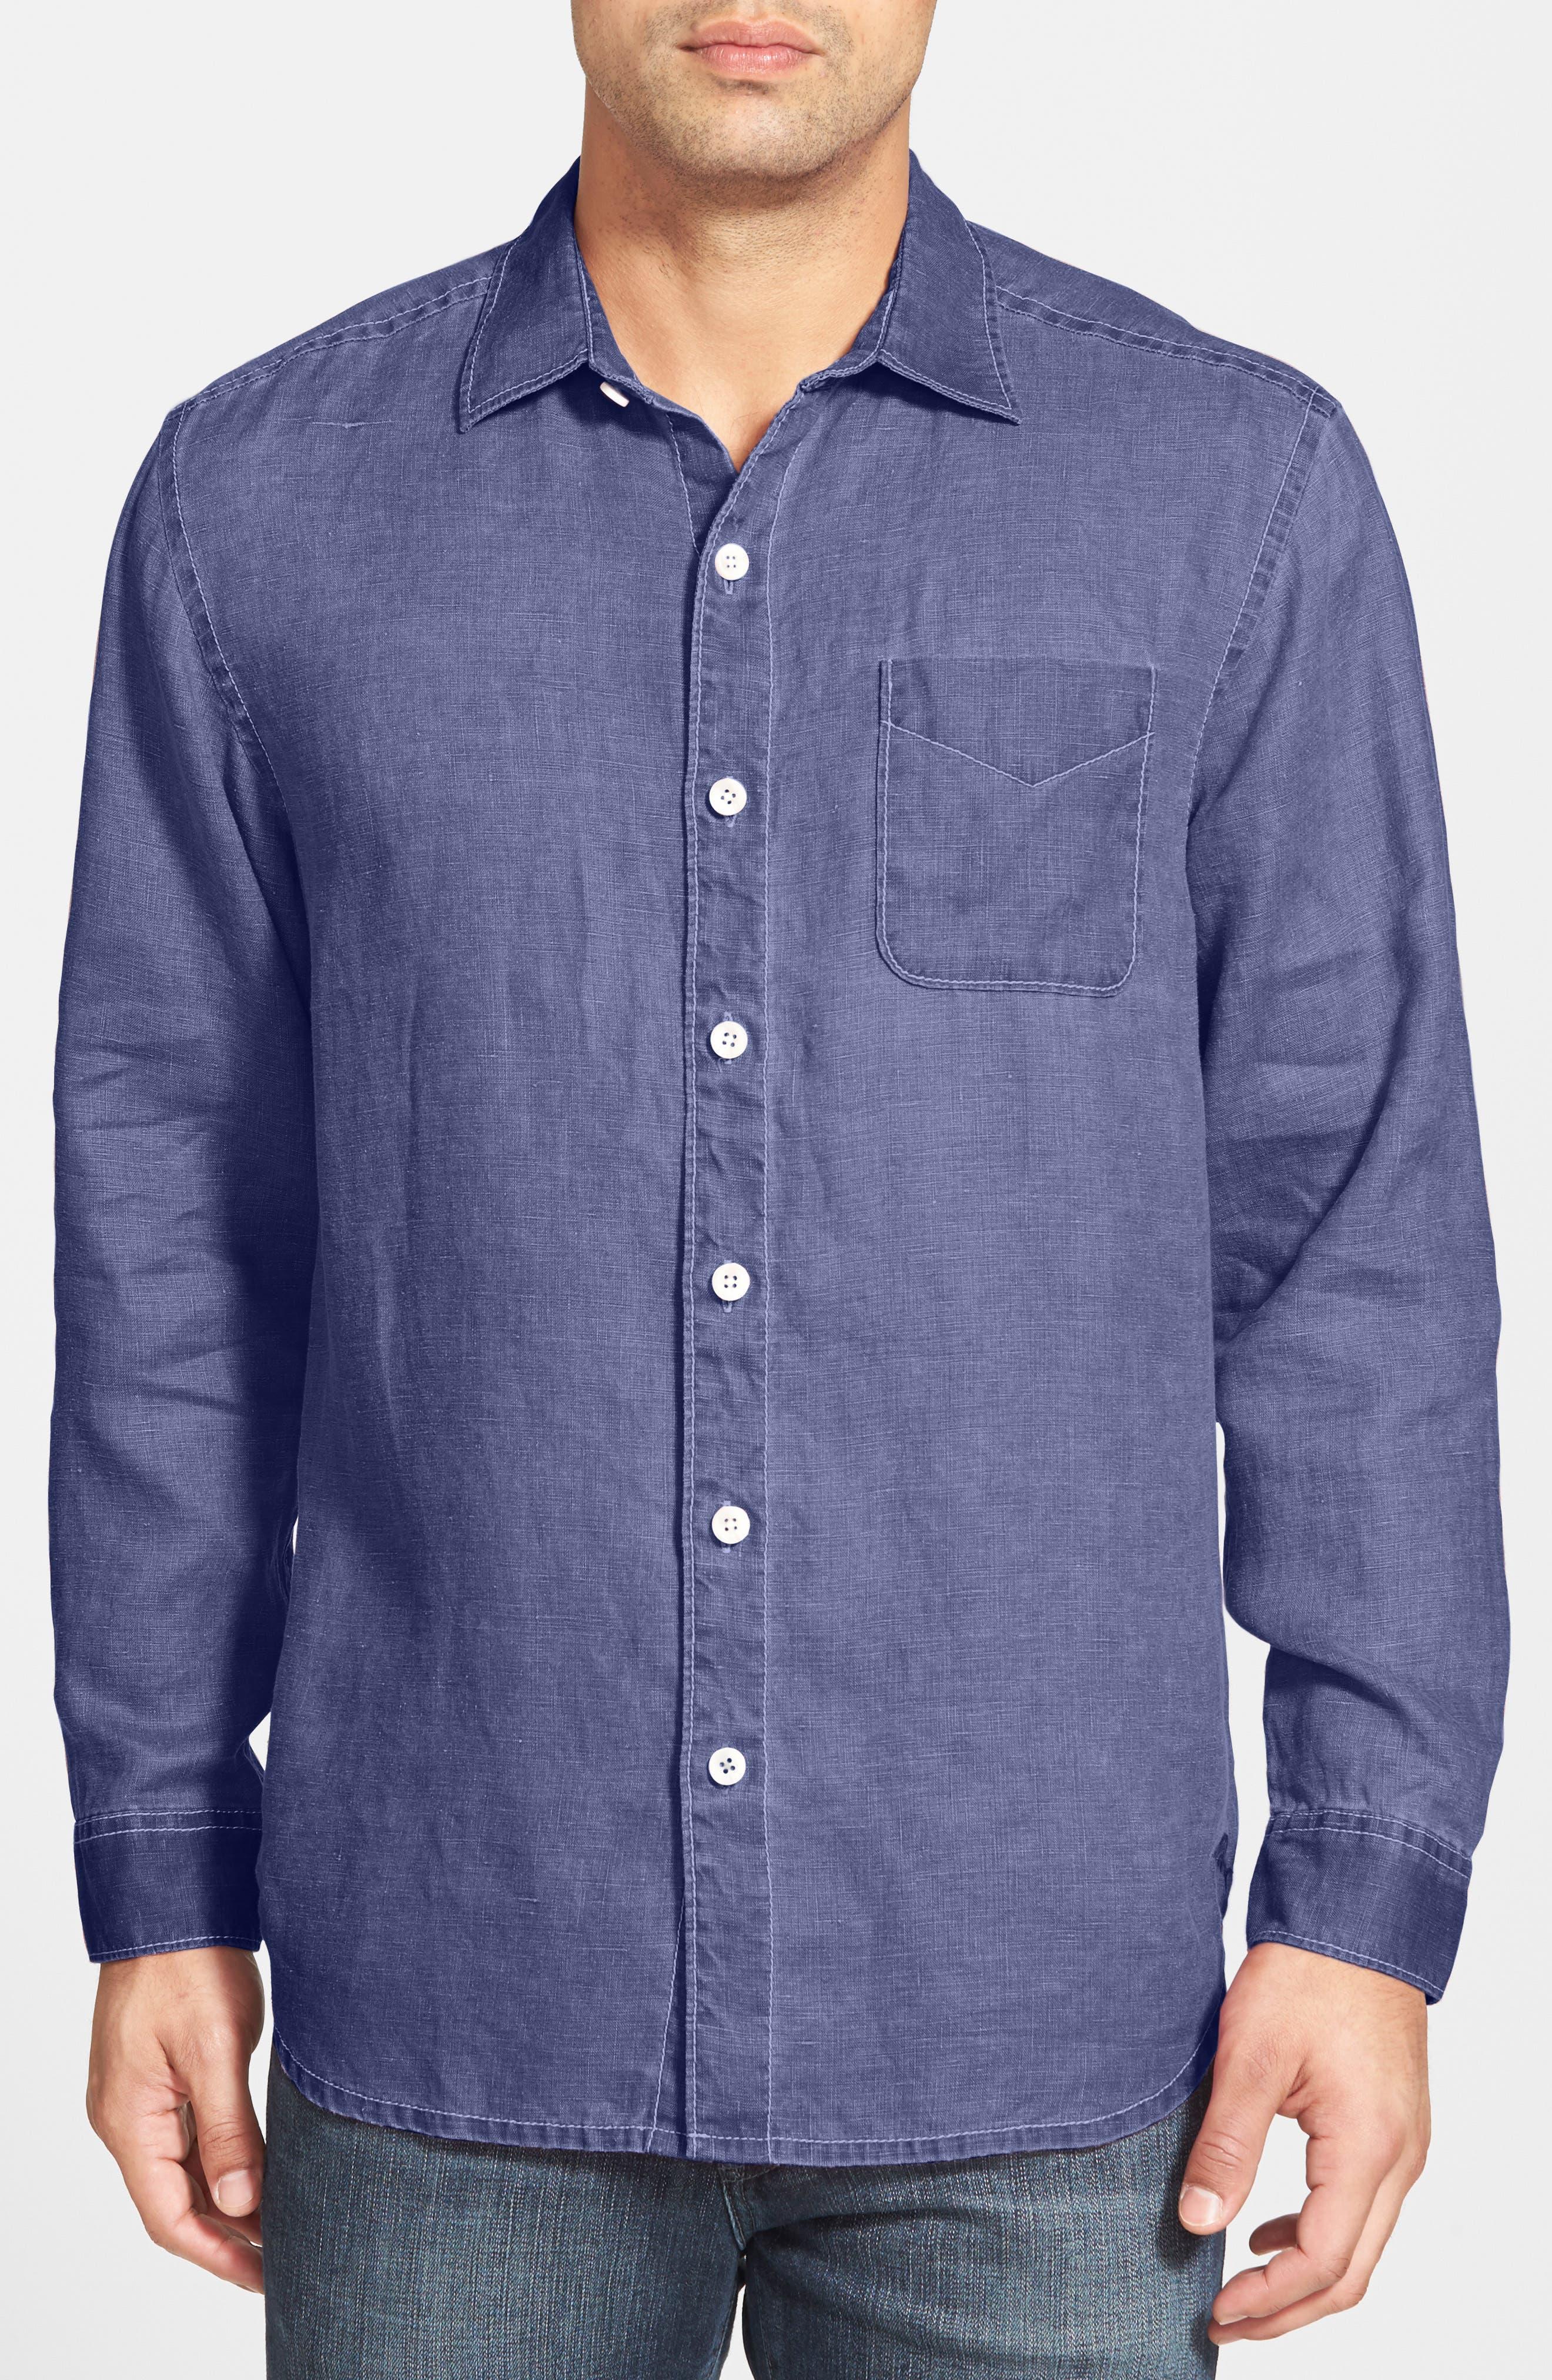 Main Image - Tommy Bahama 'Sea Glass Breezer' Original Fit Linen Shirt